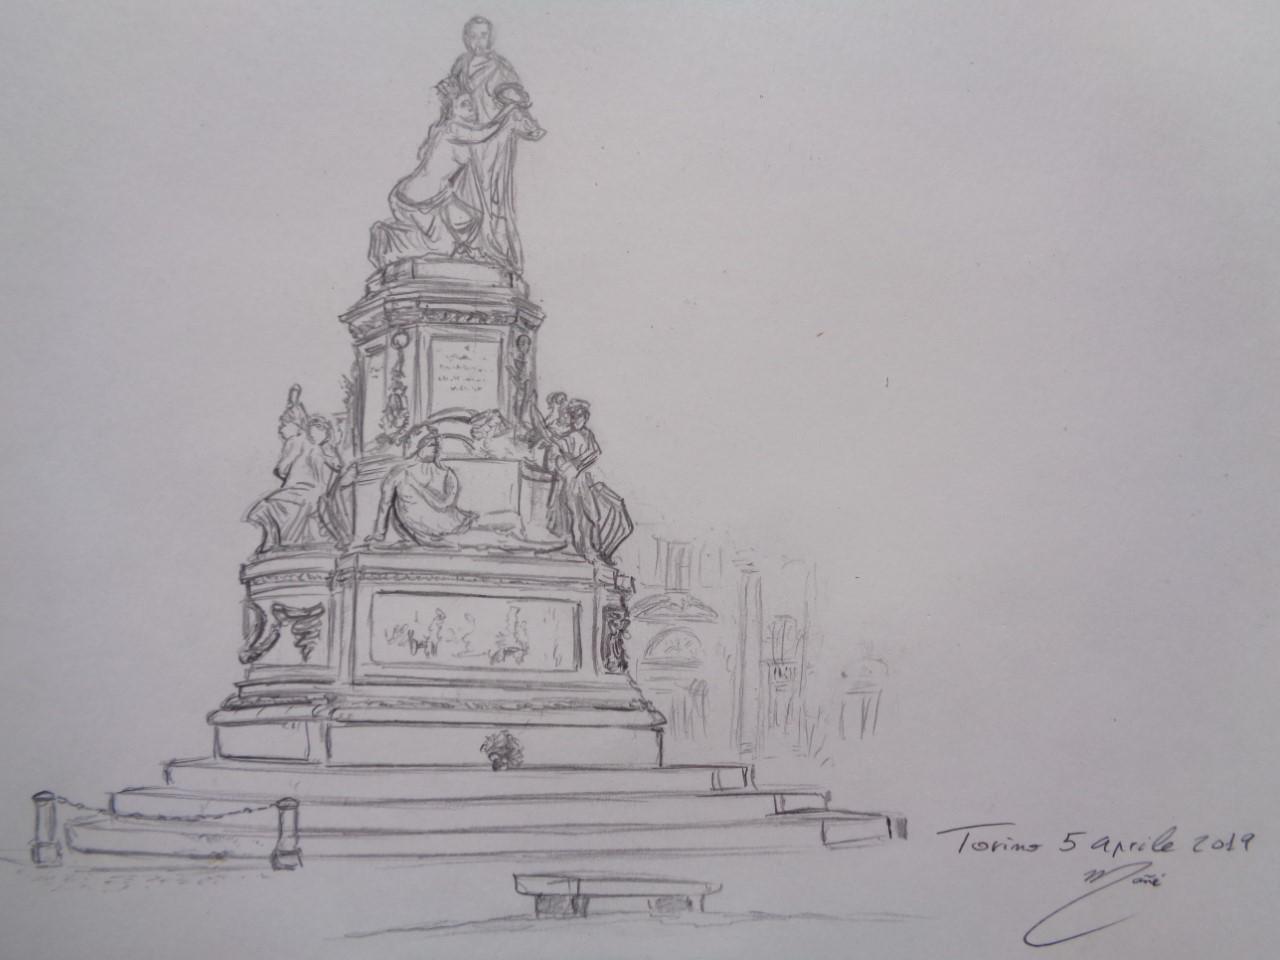 Camillo Benso monument, Piazza Carlo Emanuele II square. Torino, Italy. Dibuix de llapis